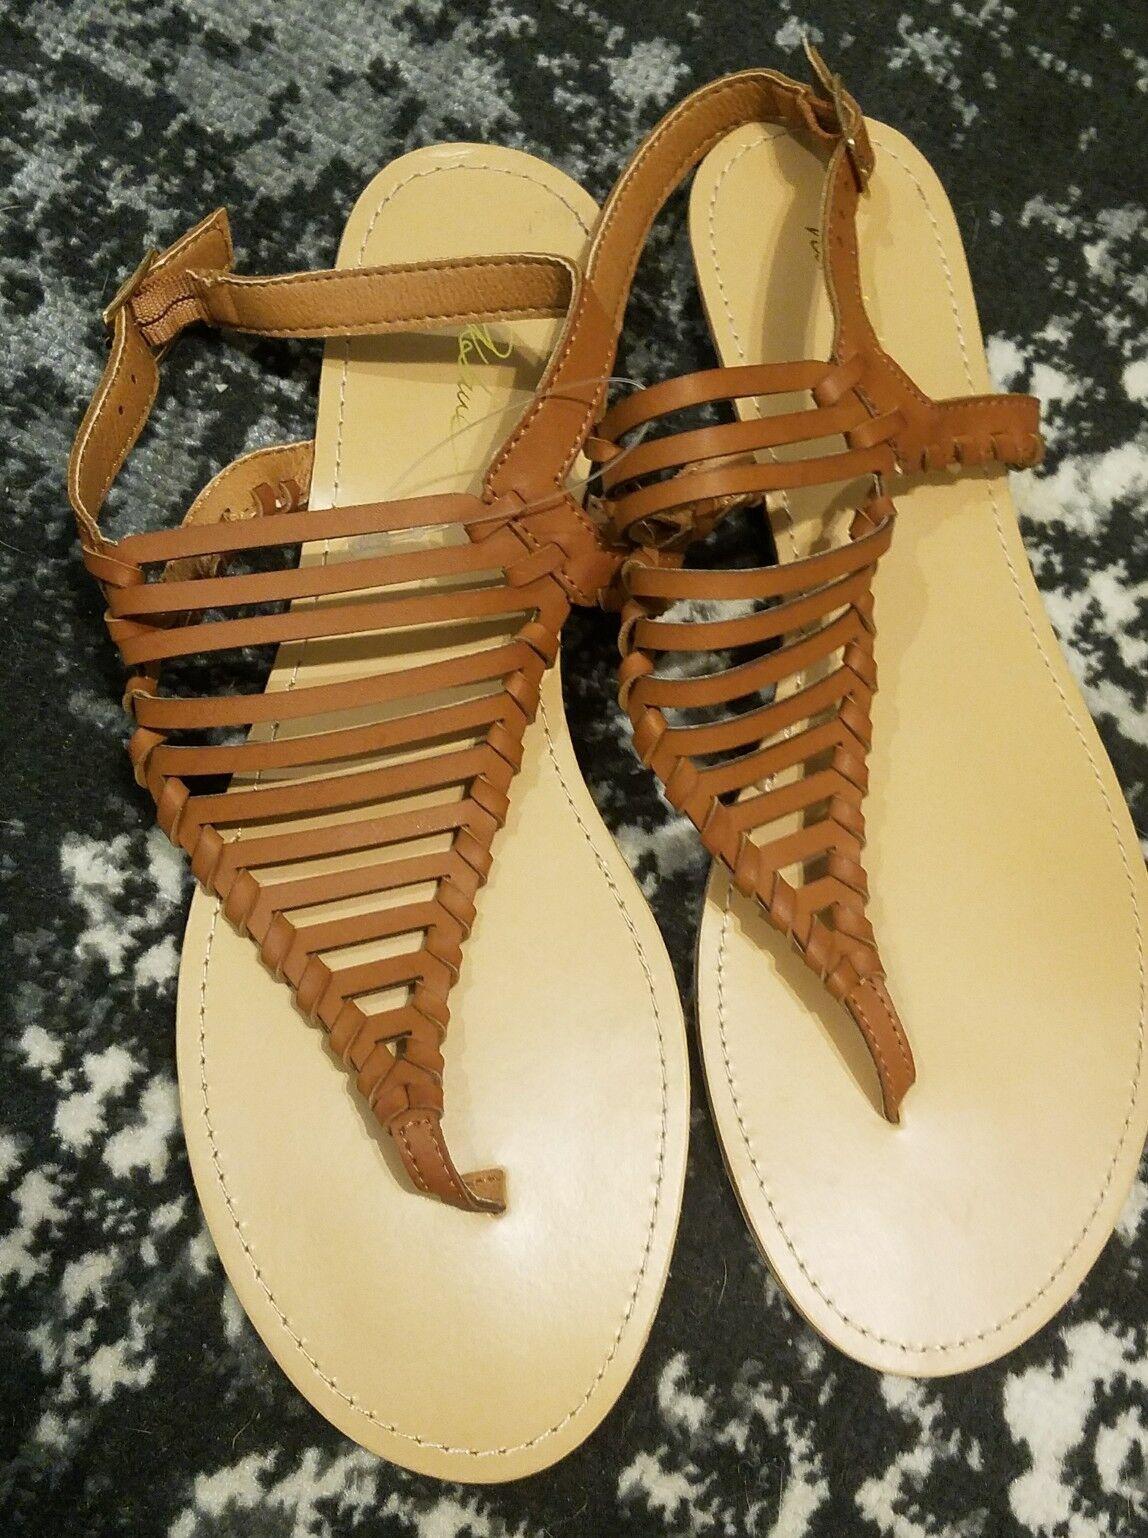 Tory Burch Women's POPPY Jelly T Logo Bow Tie Thong Sandals Orange SIZE 6